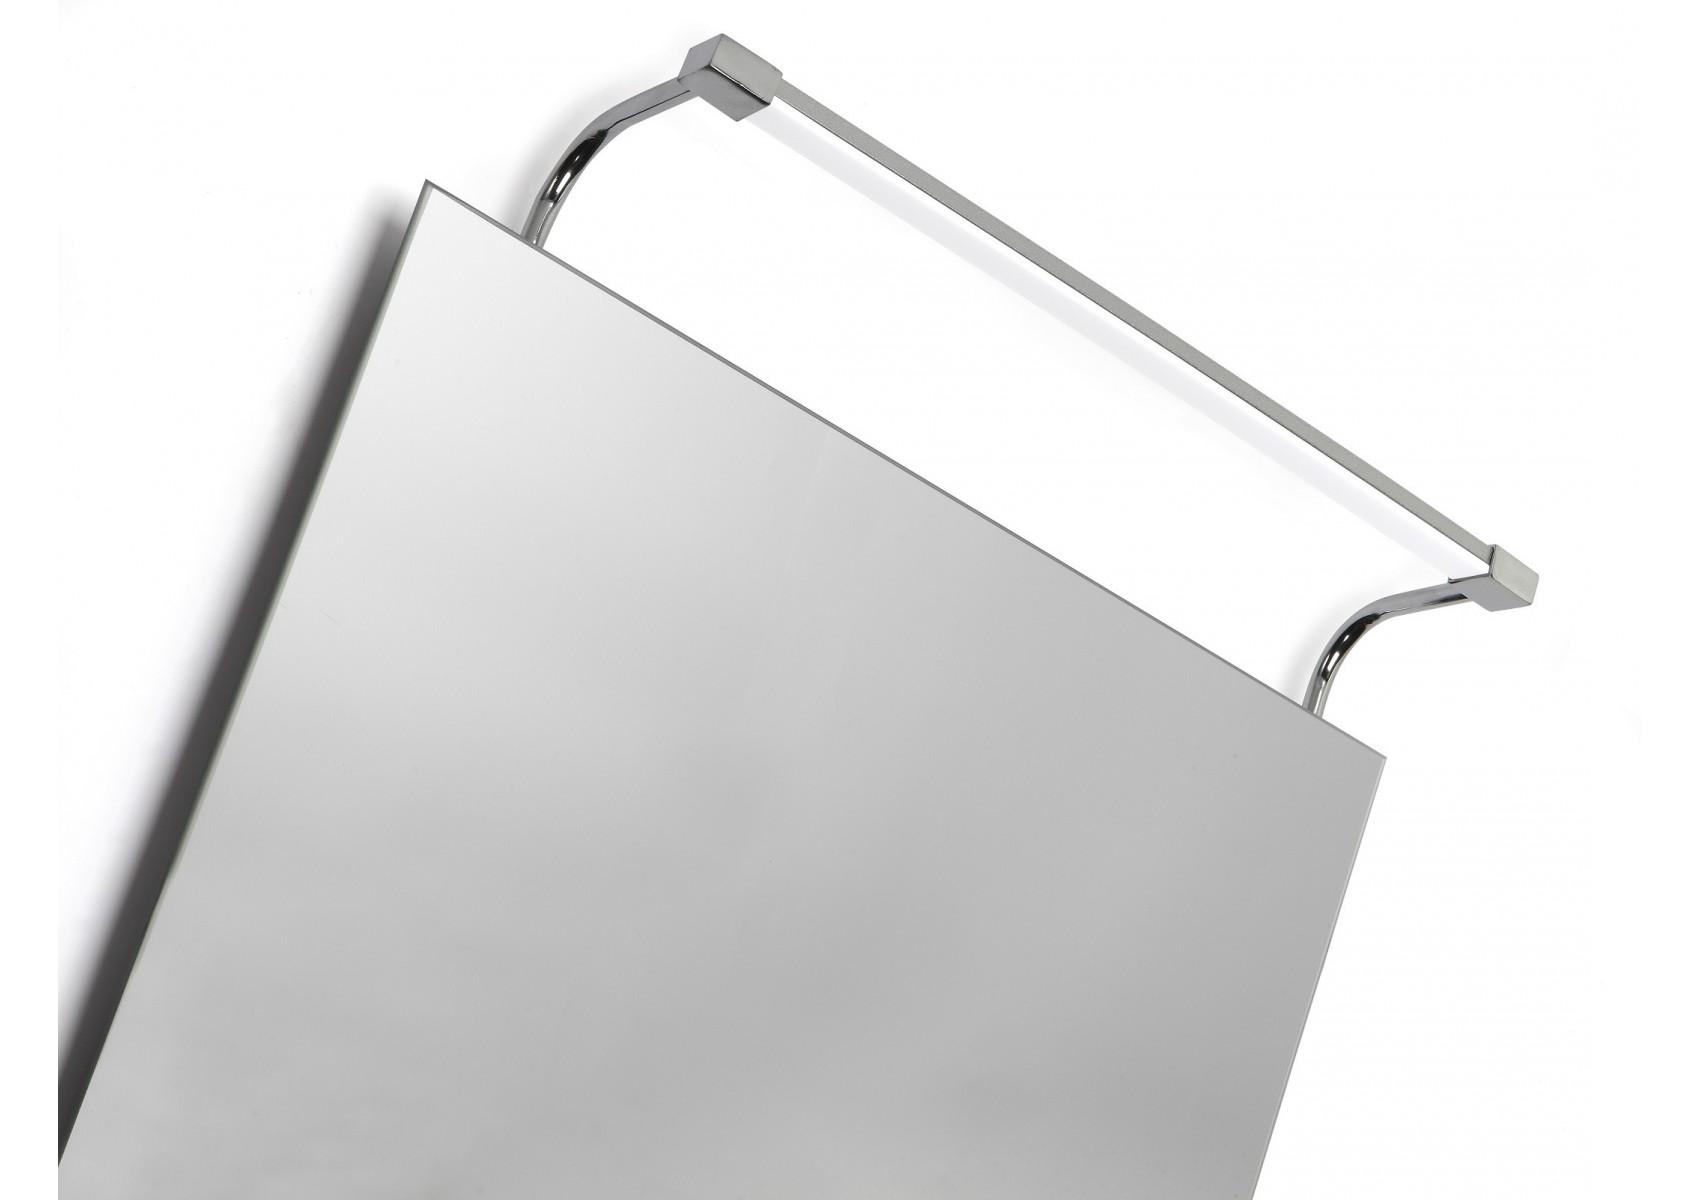 applique design sisley salle de bain et tableau 40cm boite design - Tableau Design Salle De Bain